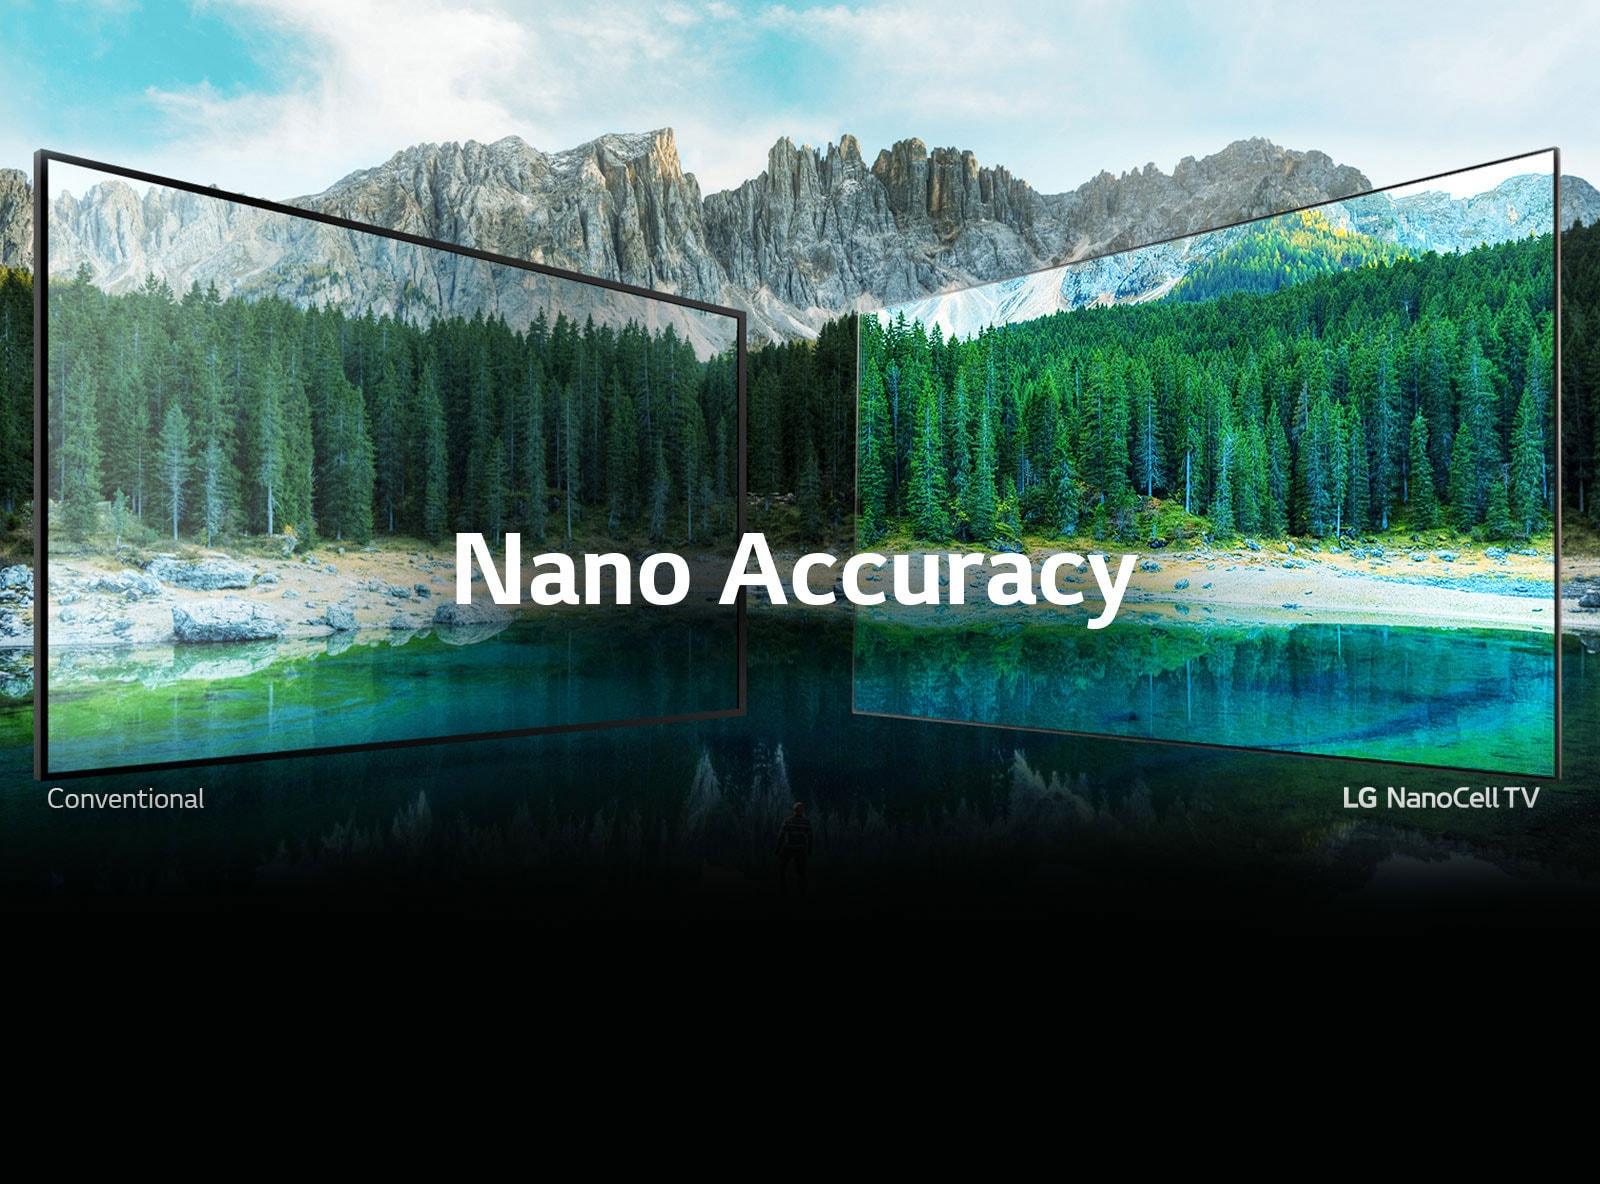 LG Nano Accuracy TV